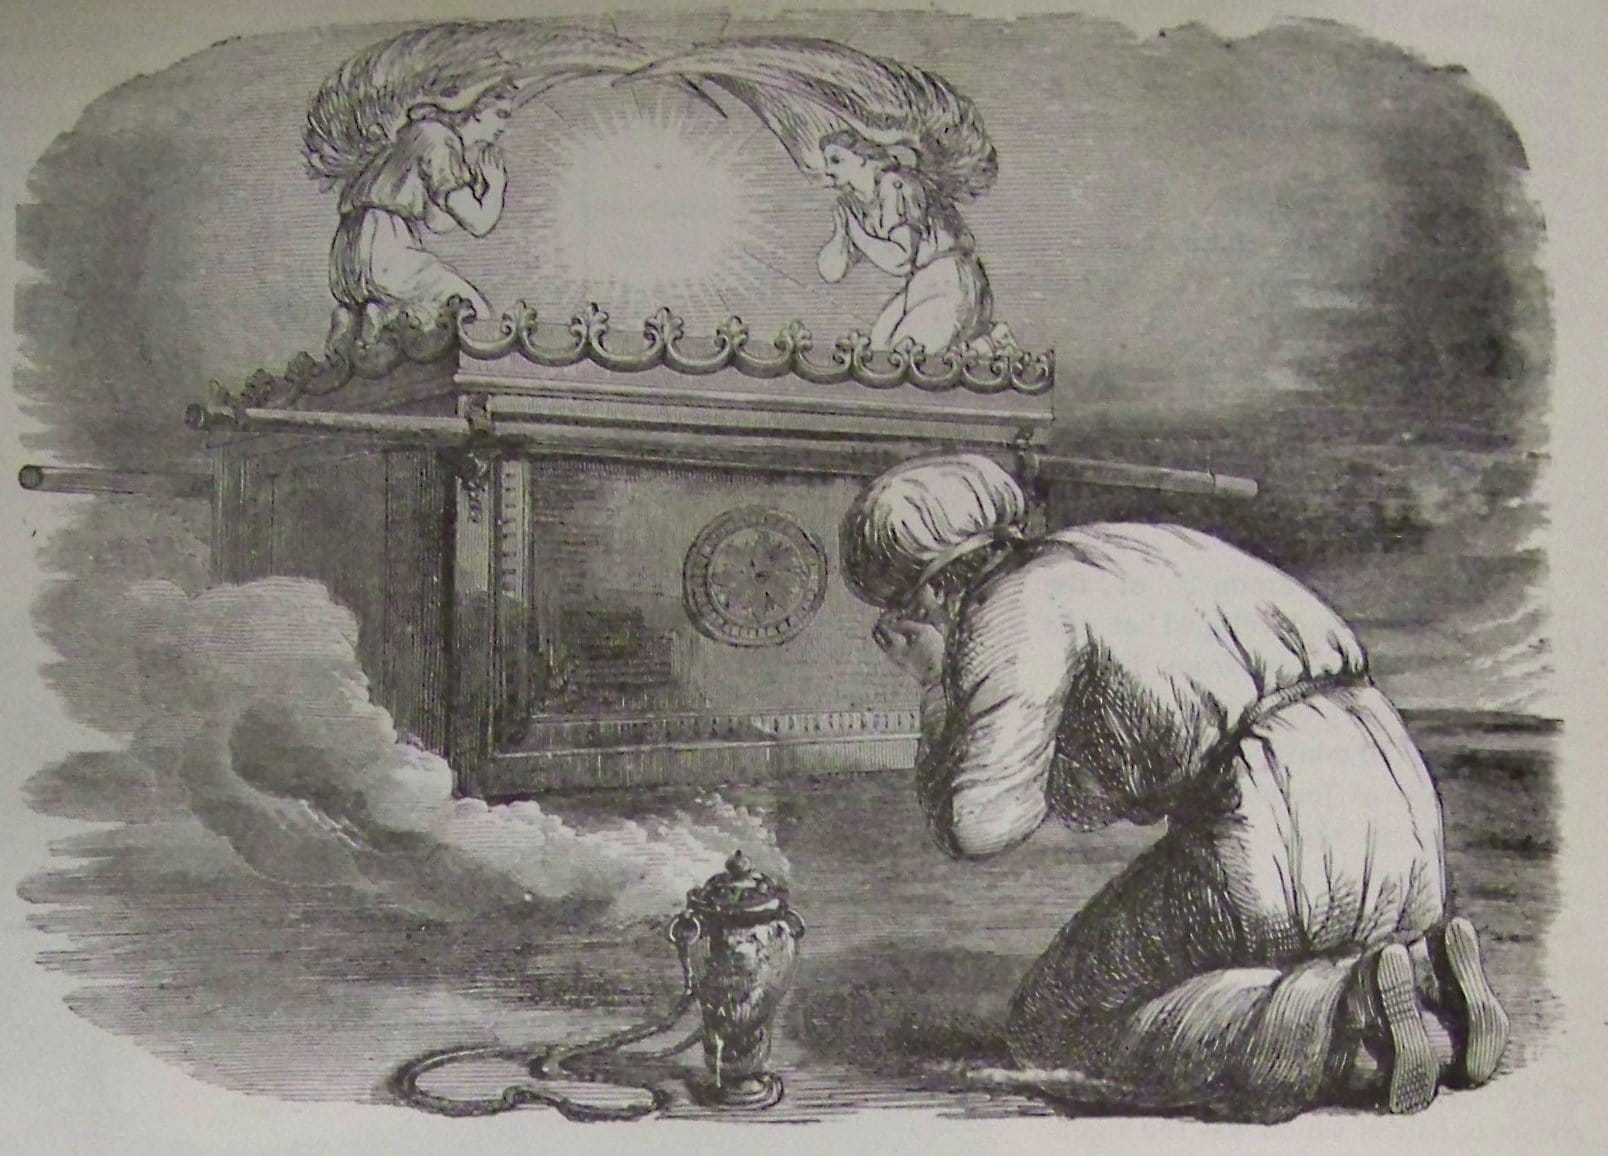 XV Prières de Yom Kippour. Torat Hamoadim